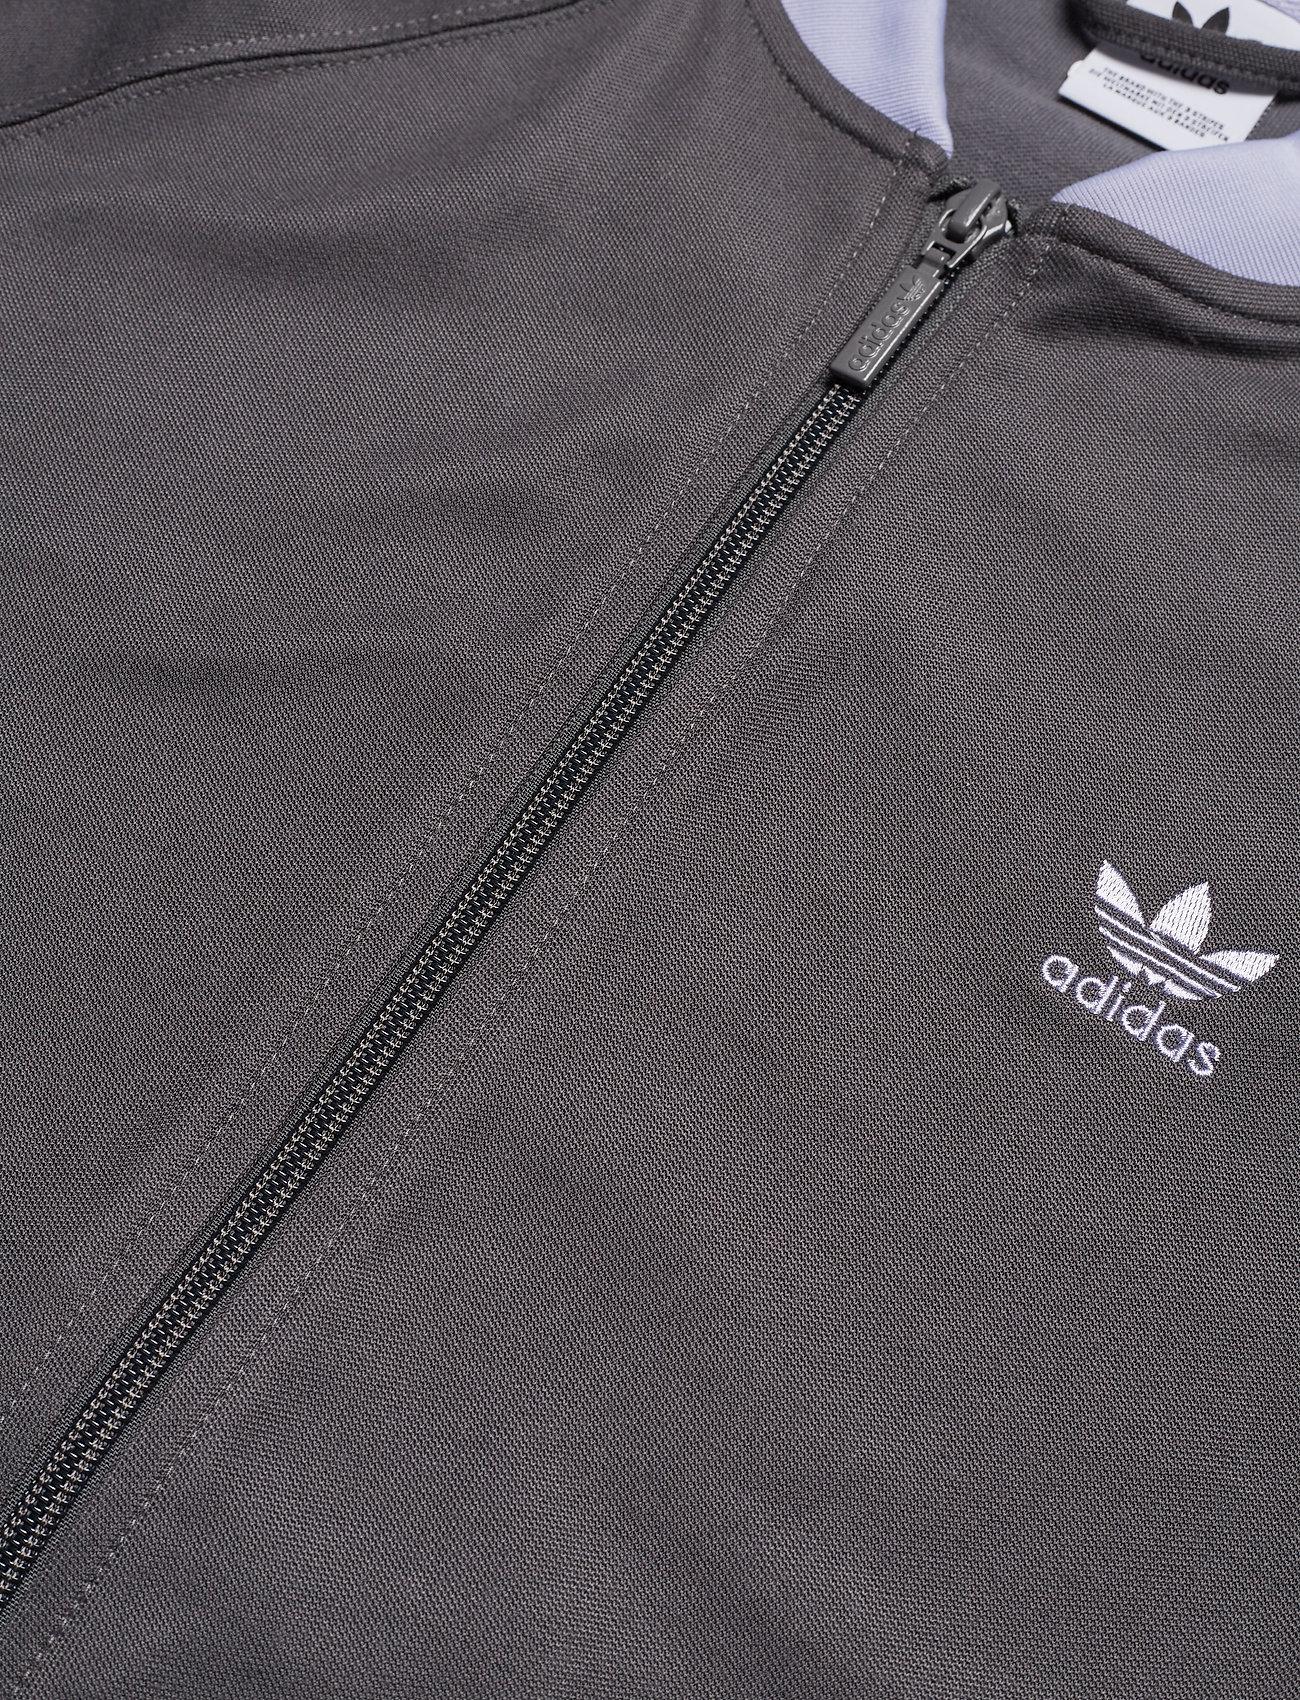 adidas Originals SST TRACK TOP Sweatshirts GRESIX